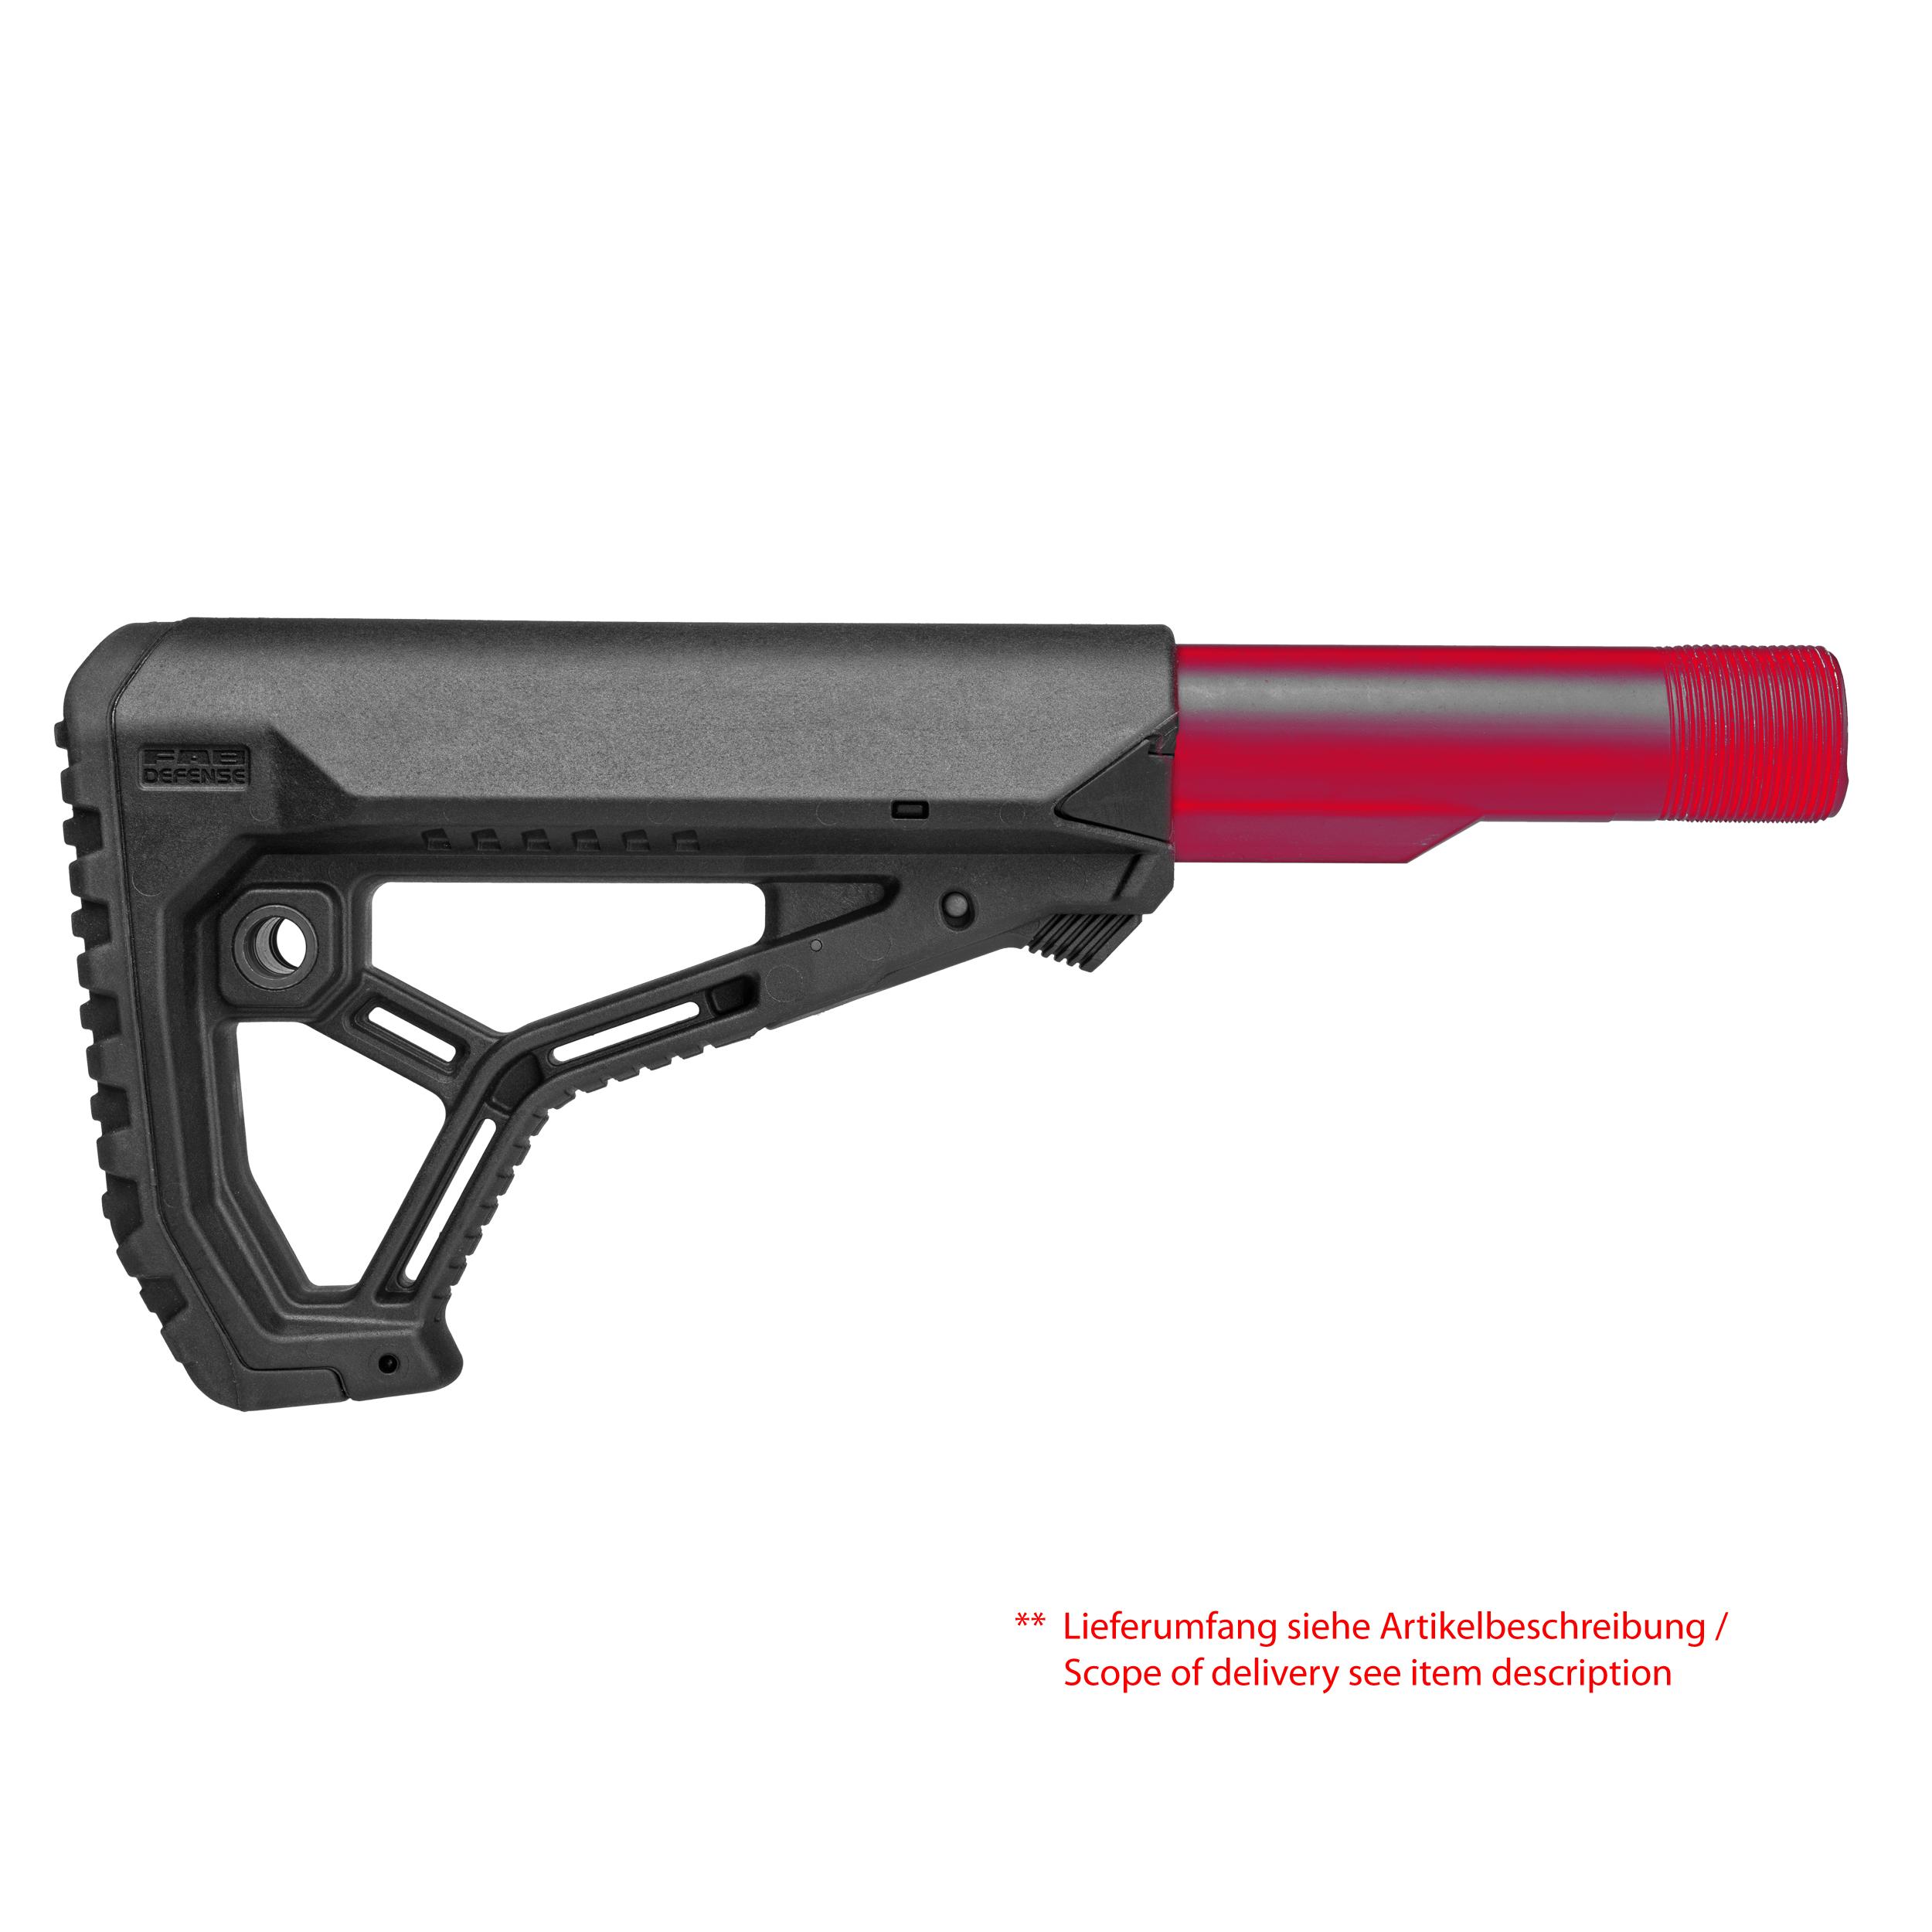 Ergonomic shaped lightweight buttstock